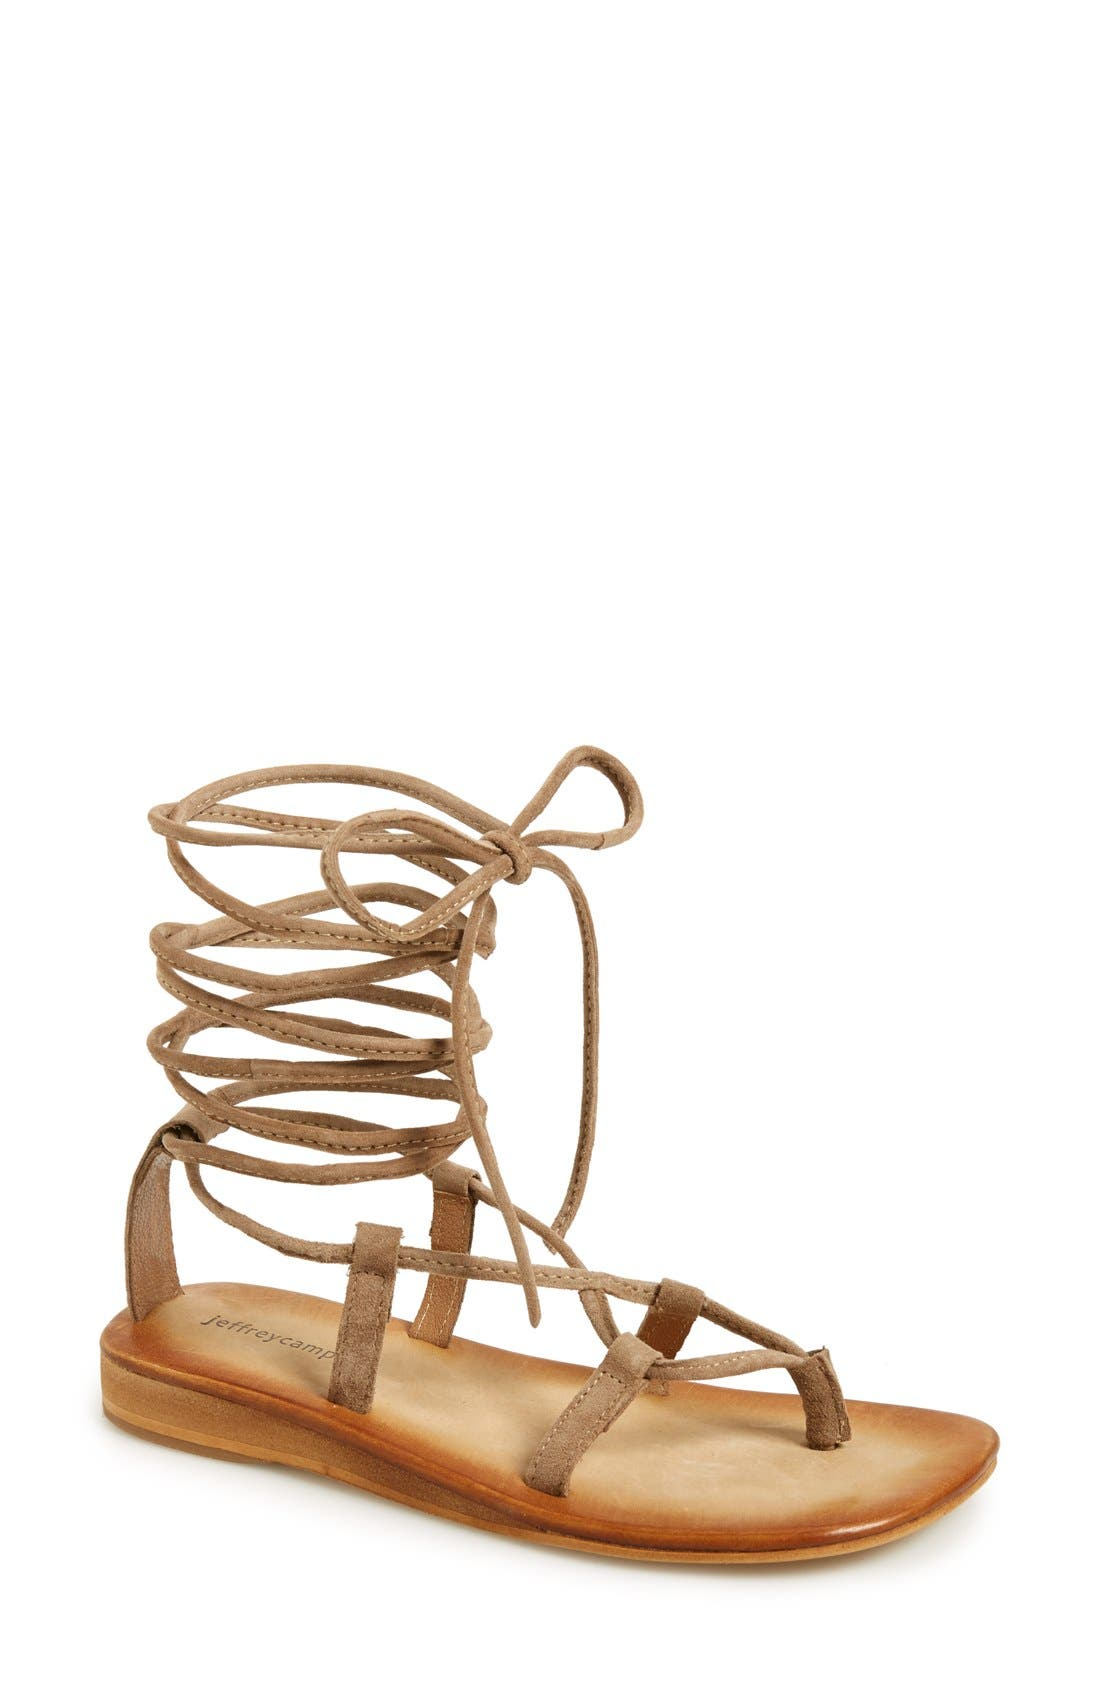 Alternate Image 1 Selected - Jeffrey Campbell 'Lima' Wraparound Strap Sandal (Women)